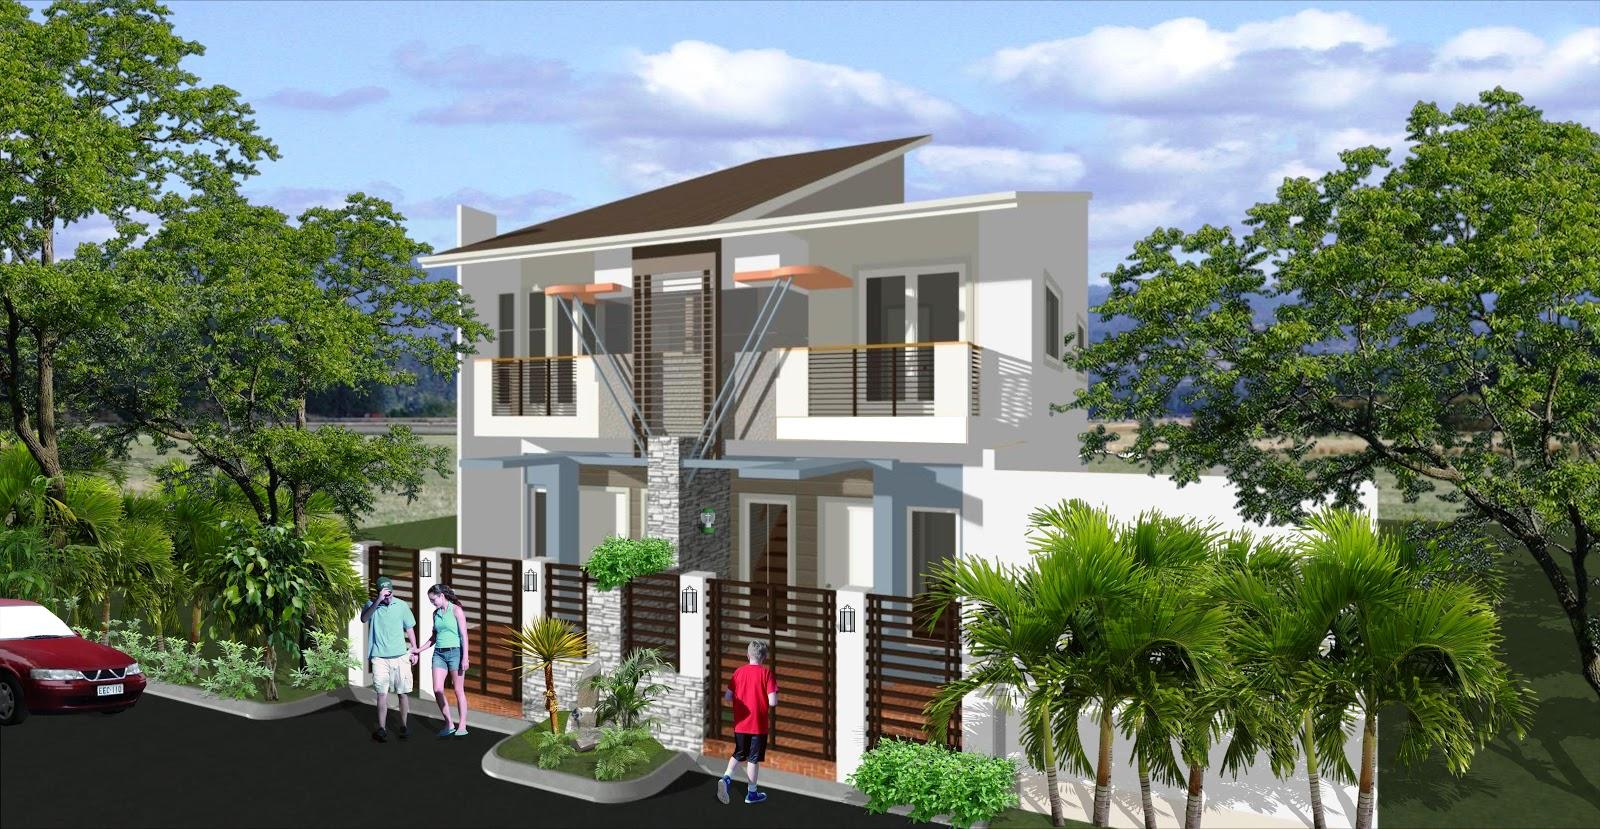 House designs philippines joy studio design gallery for Filipino house design